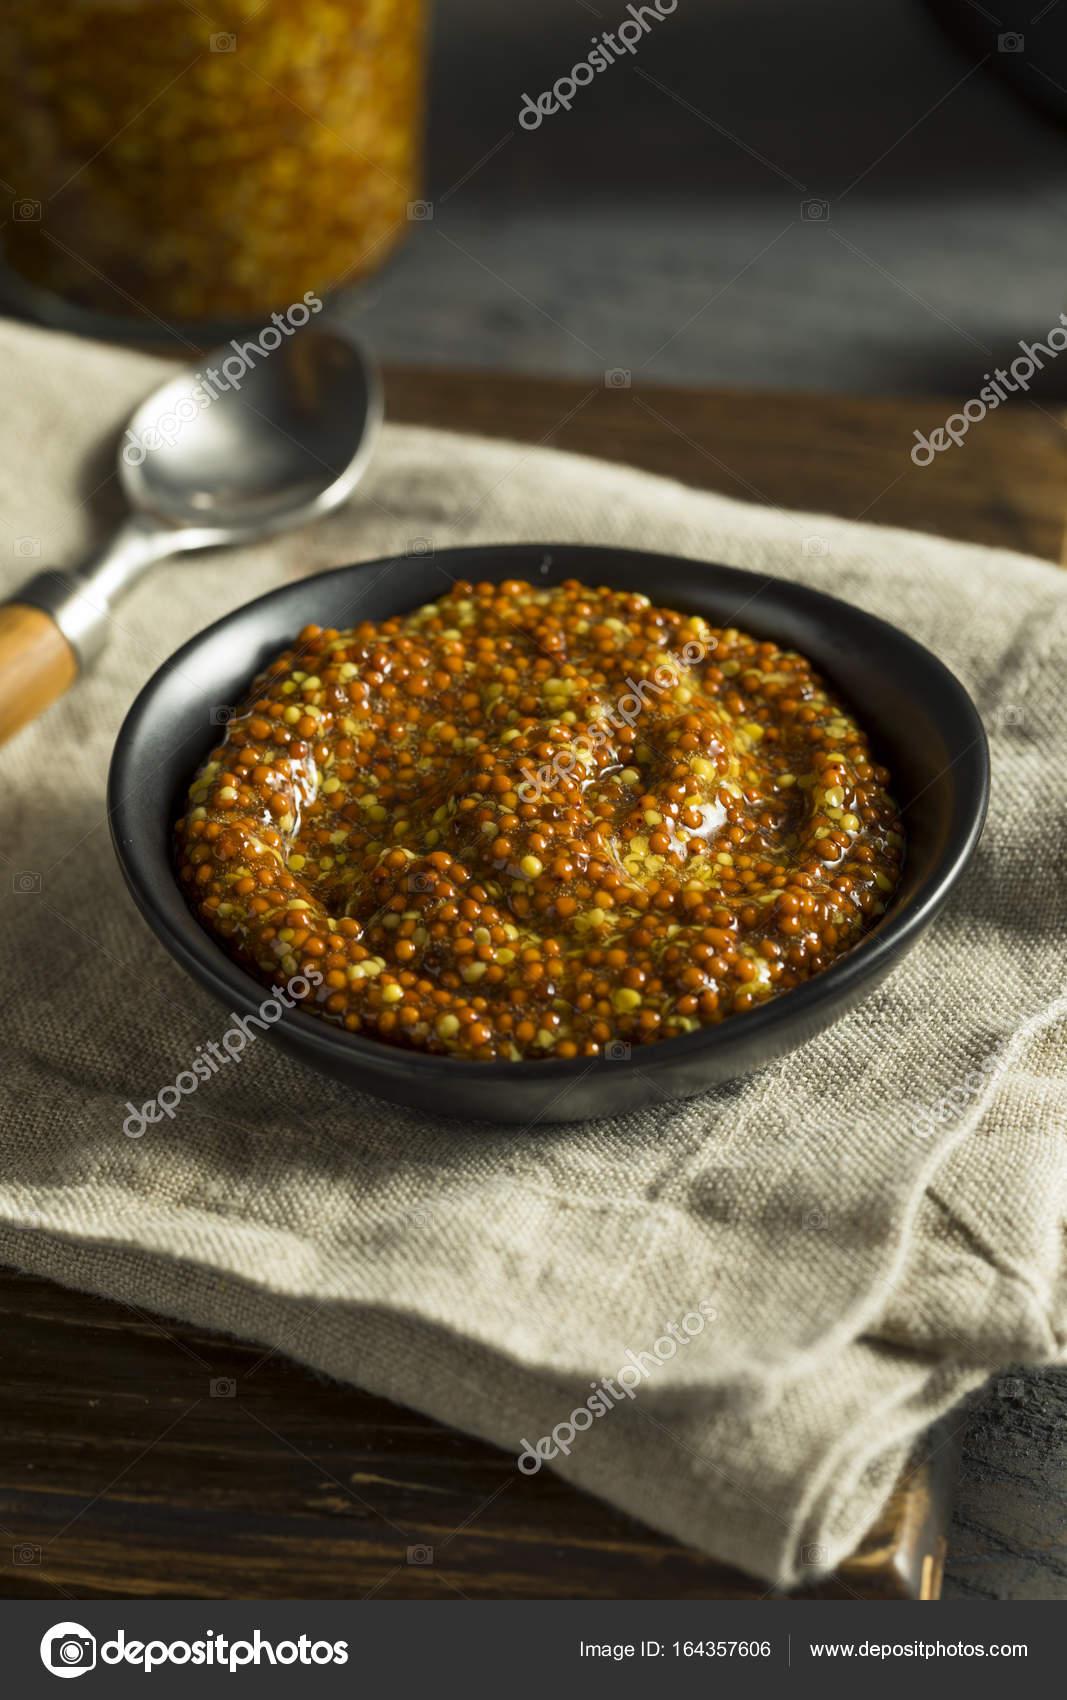 Homemade Organic Fancy Dijon Mustard